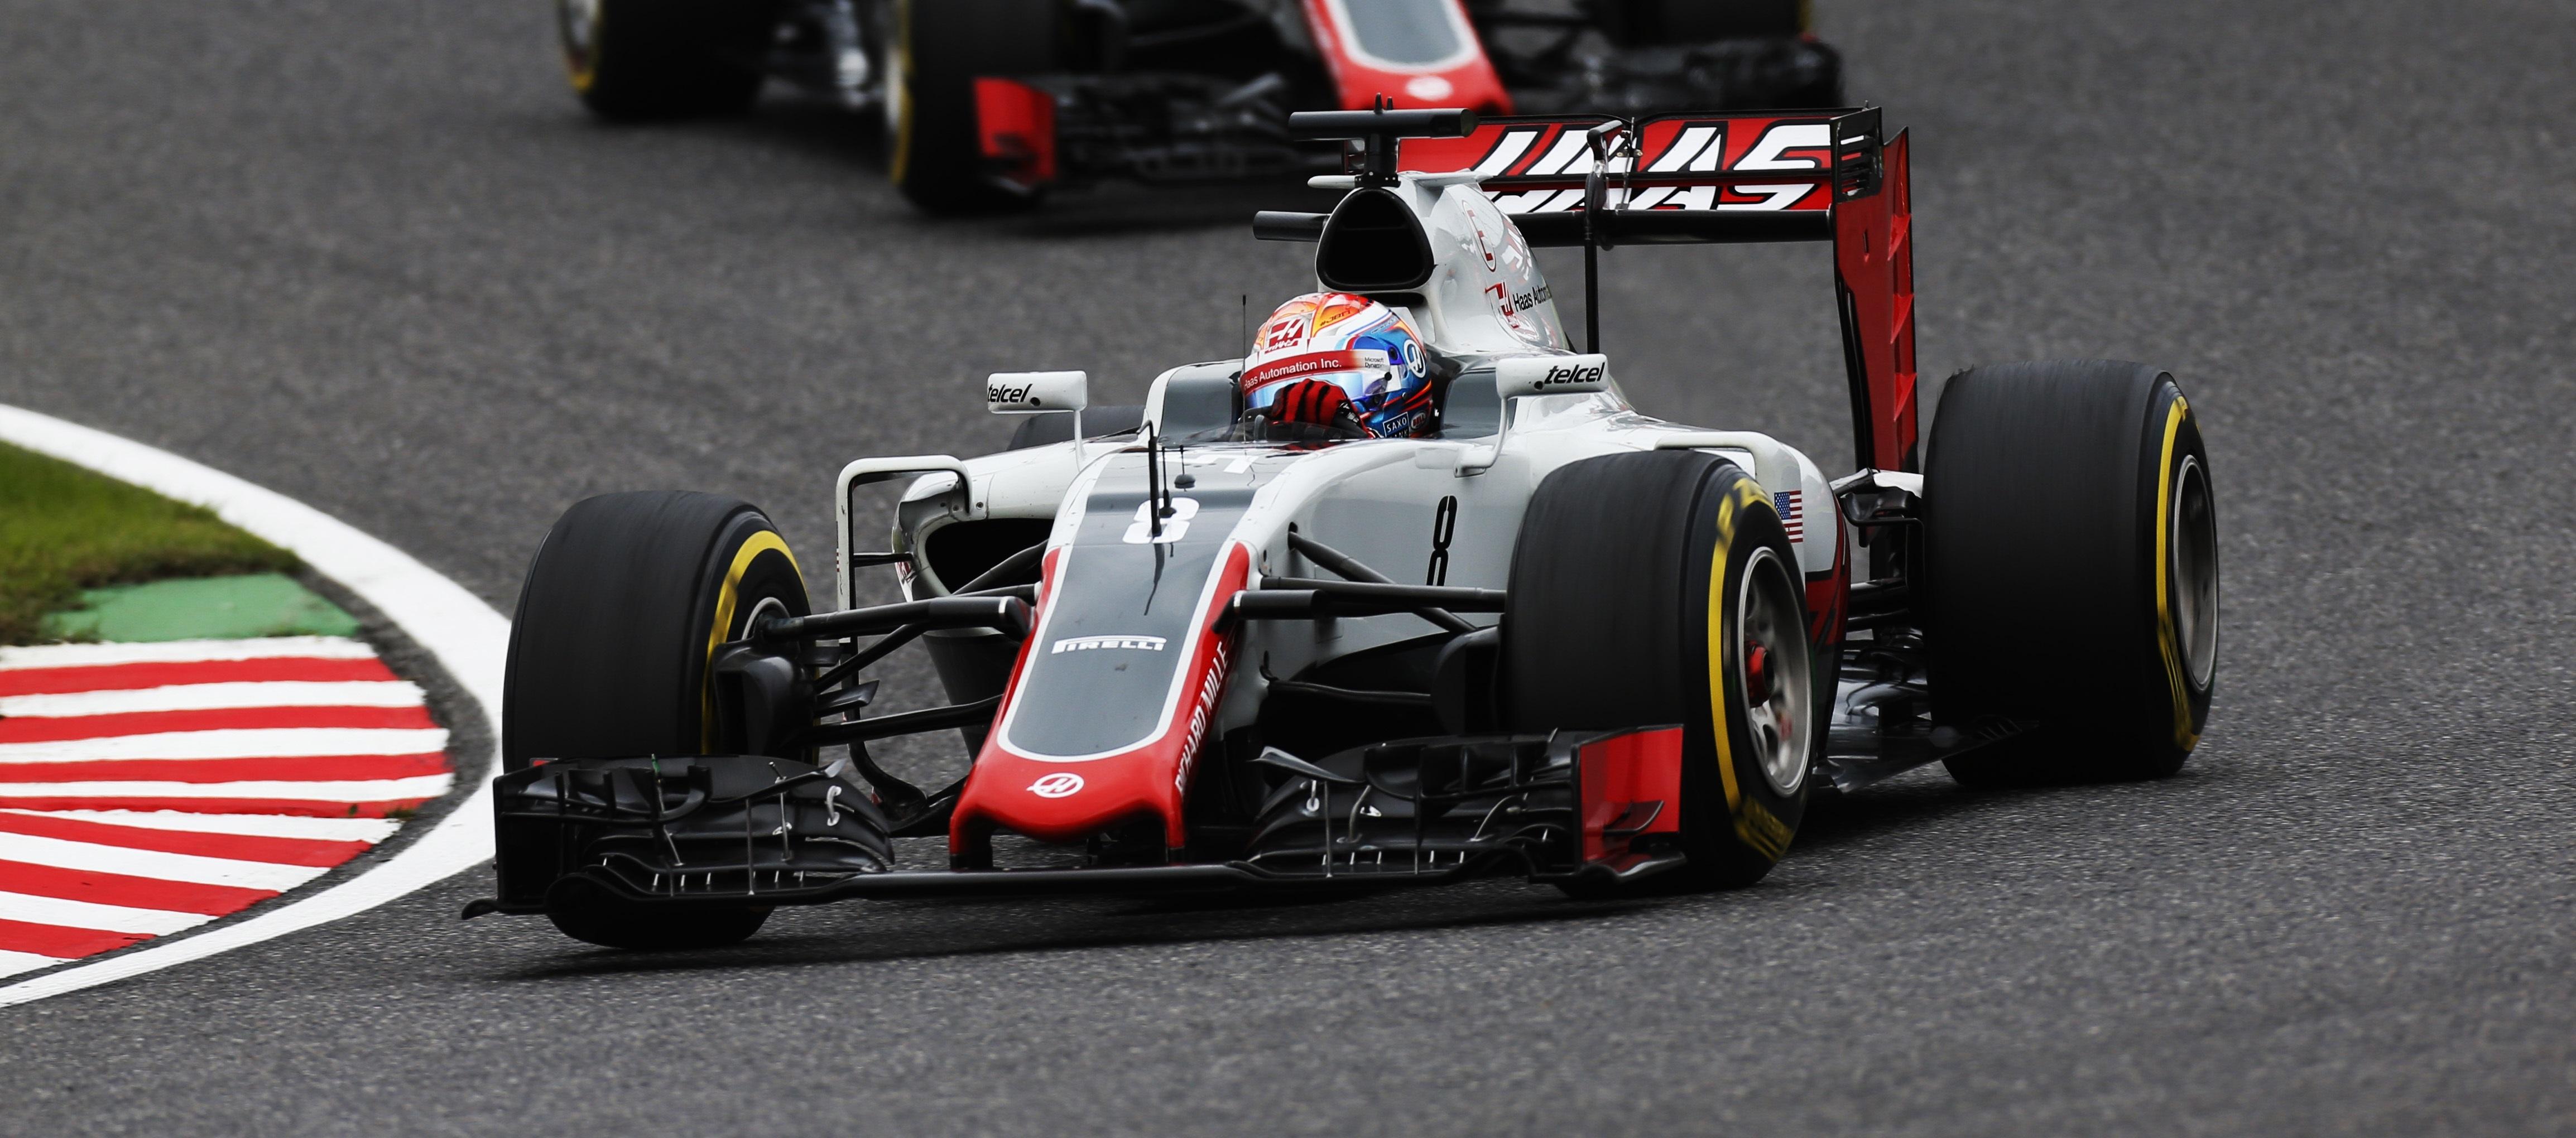 Romain Grosjean 2016